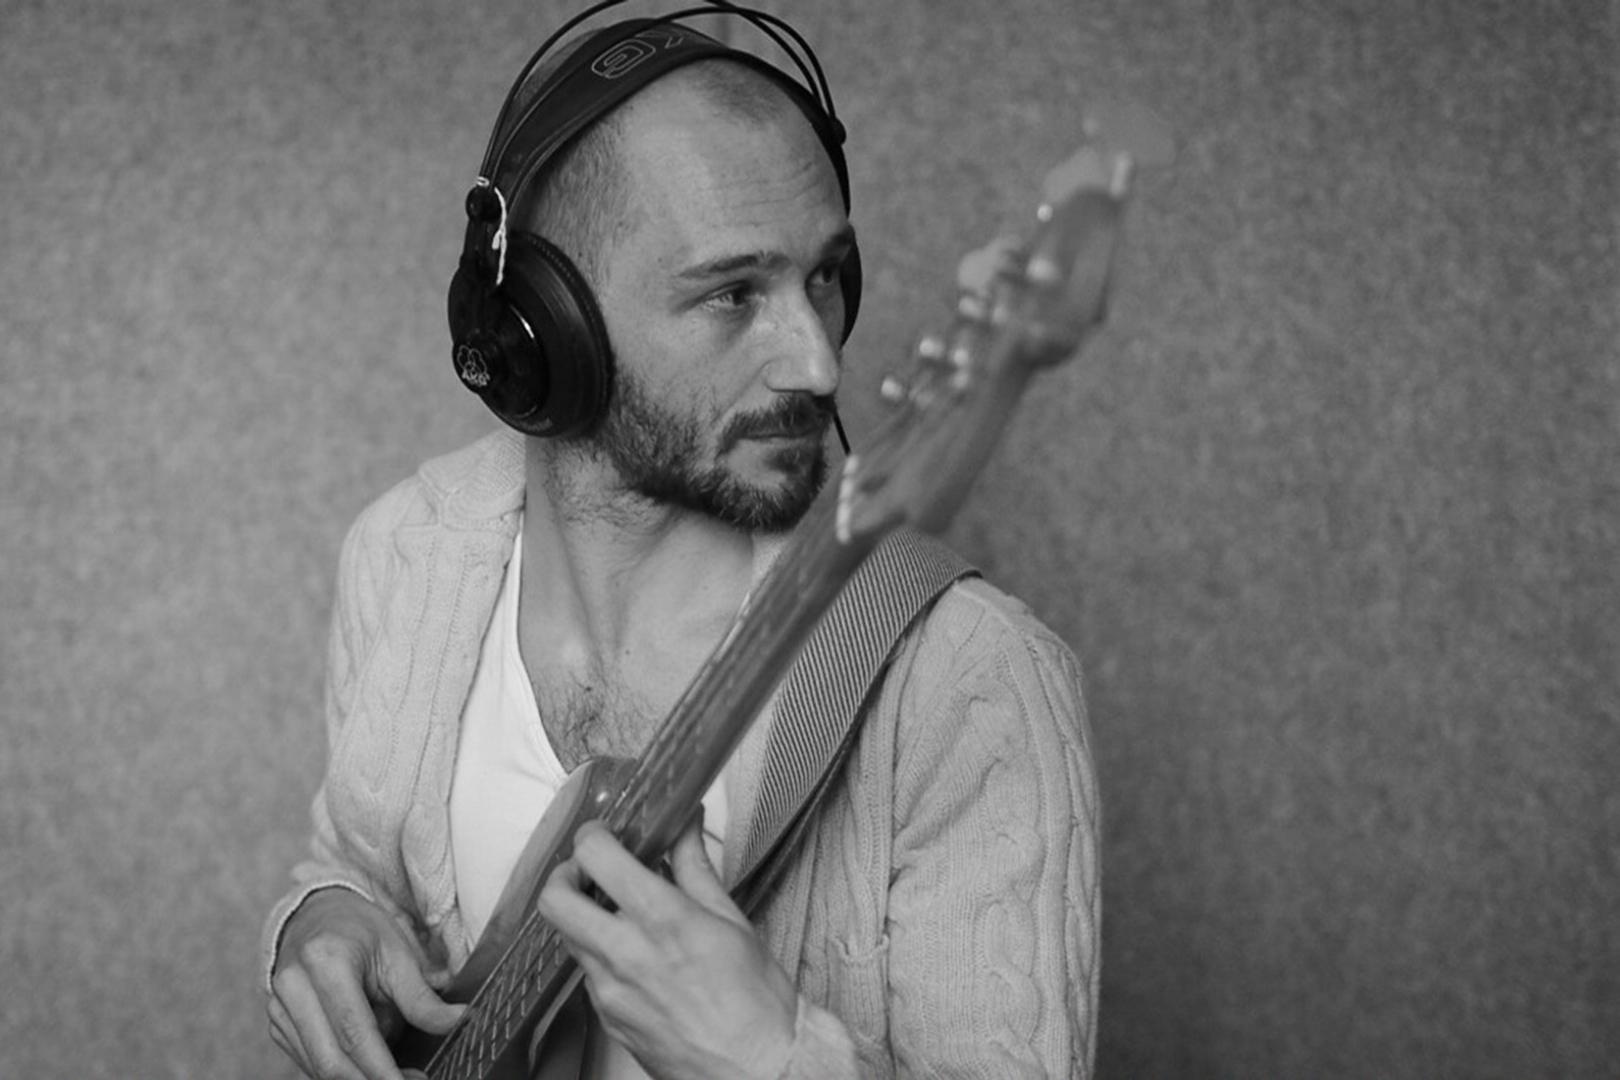 julien tauban_recording bass in studio.JPG